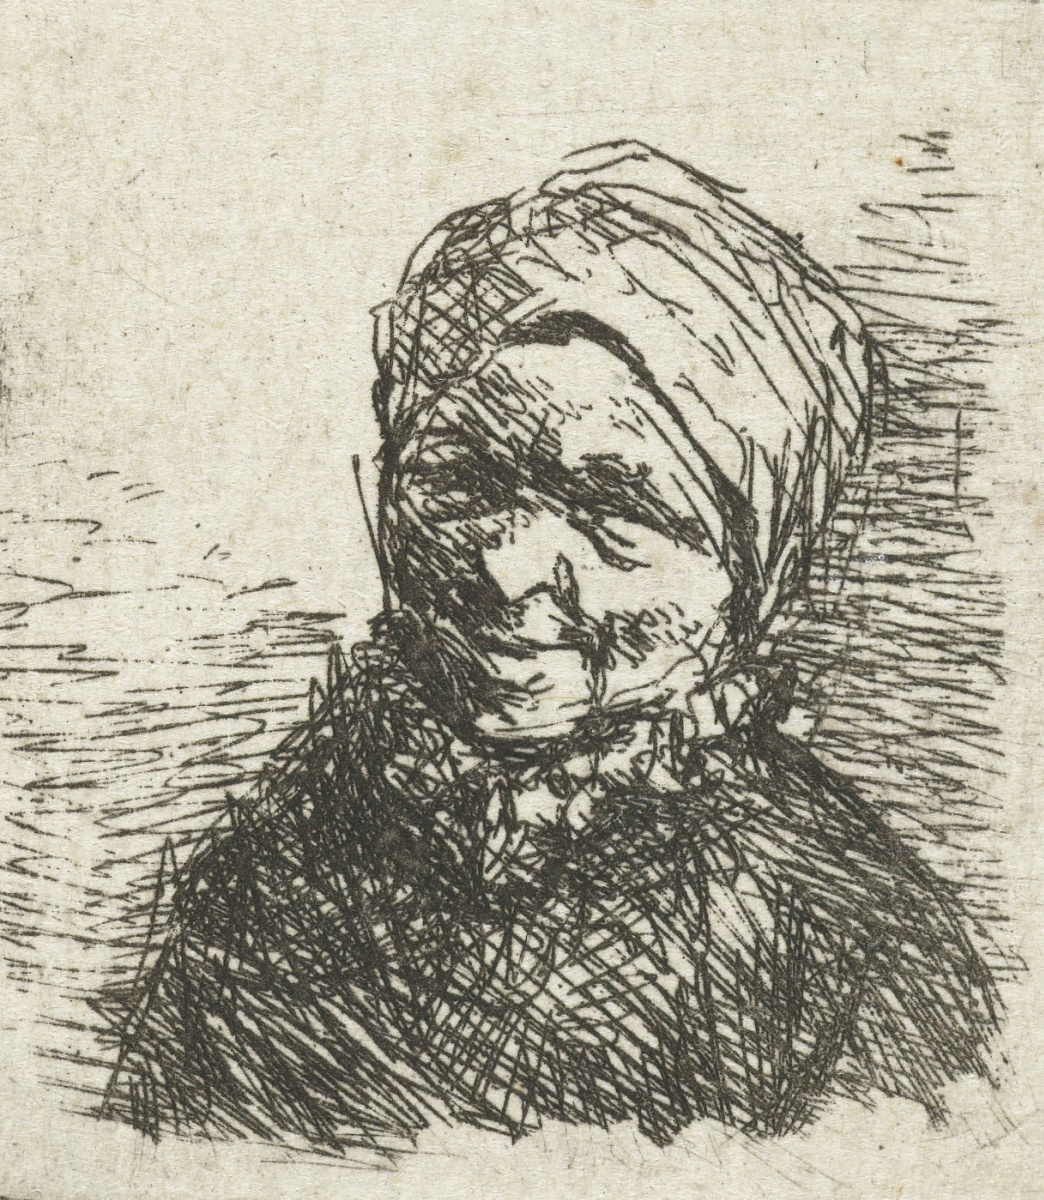 Adrian Jans van Ostade. Smiling woman